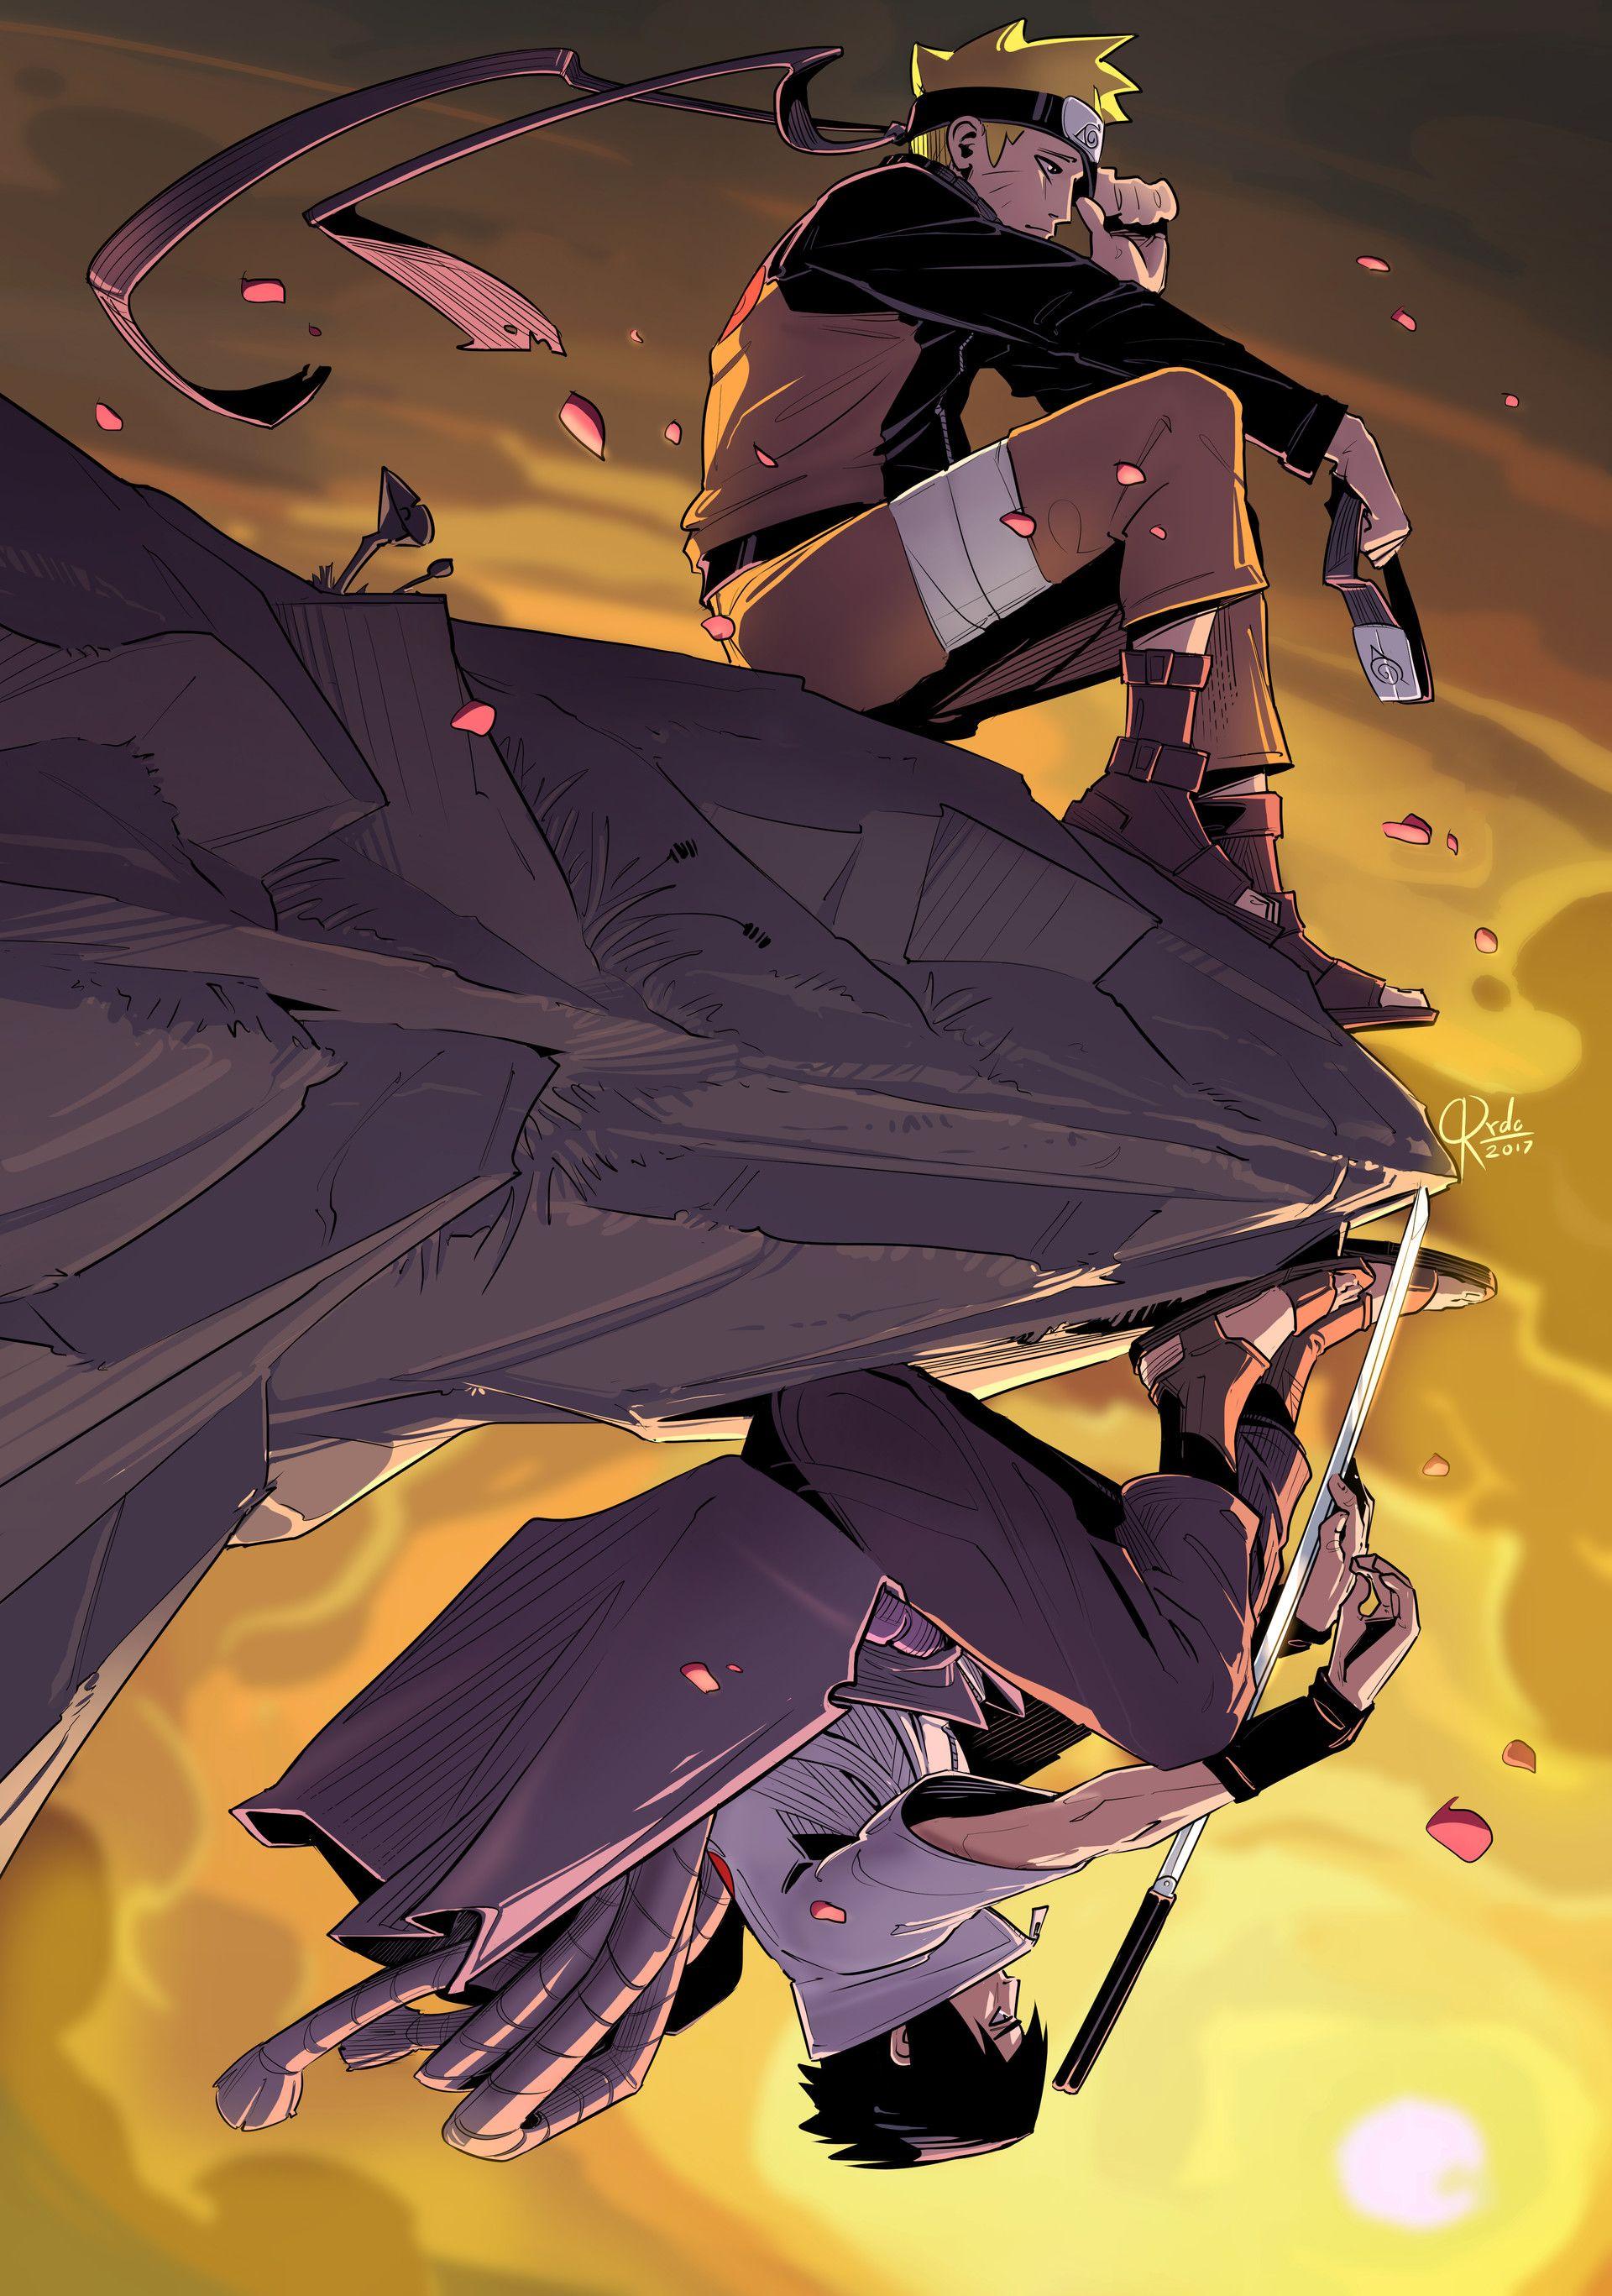 NARUTO   page 65 of 2022 - Zerochan Anime Image Board